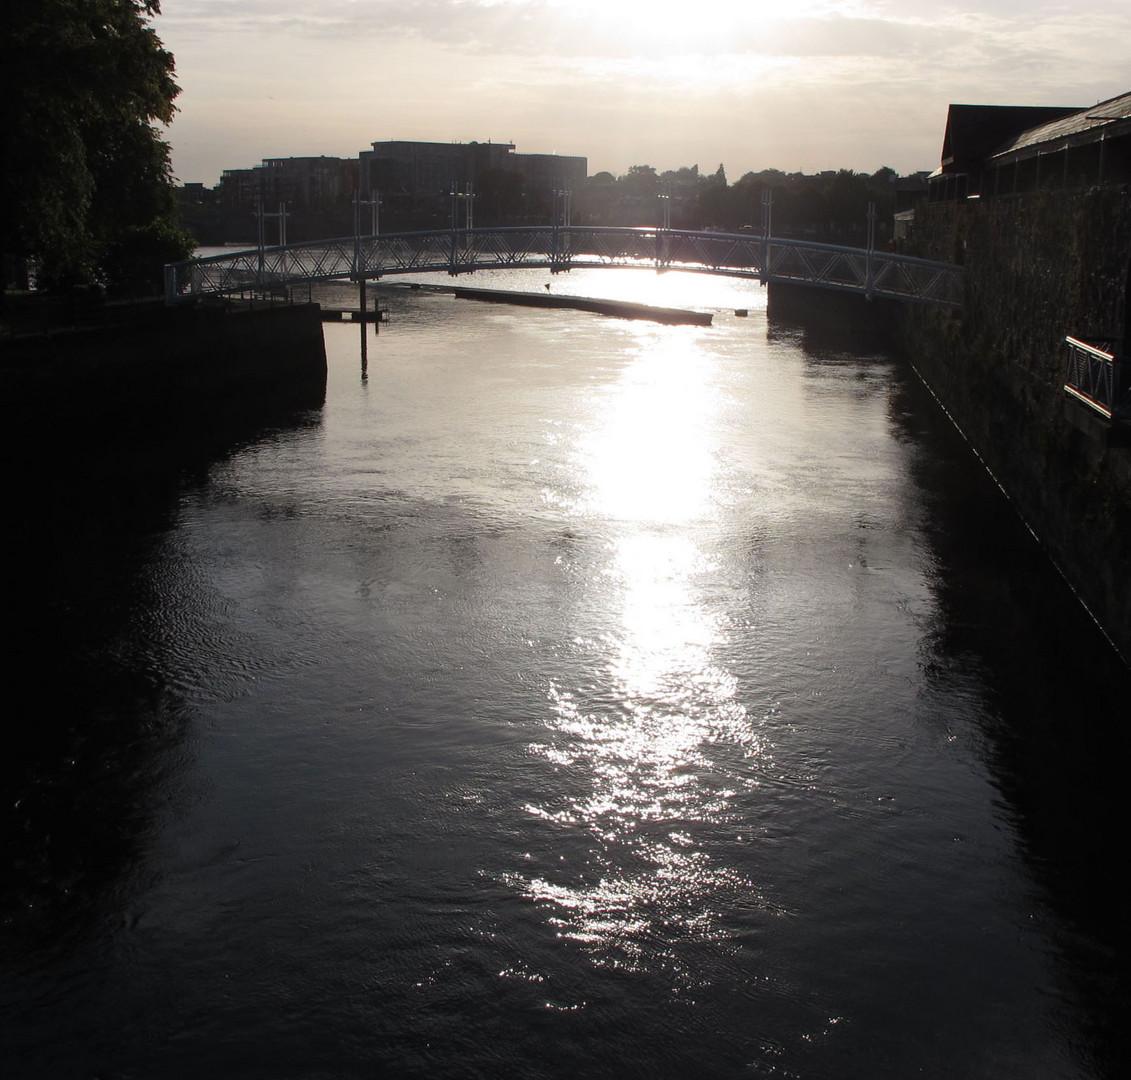 Limerick, Shannon River